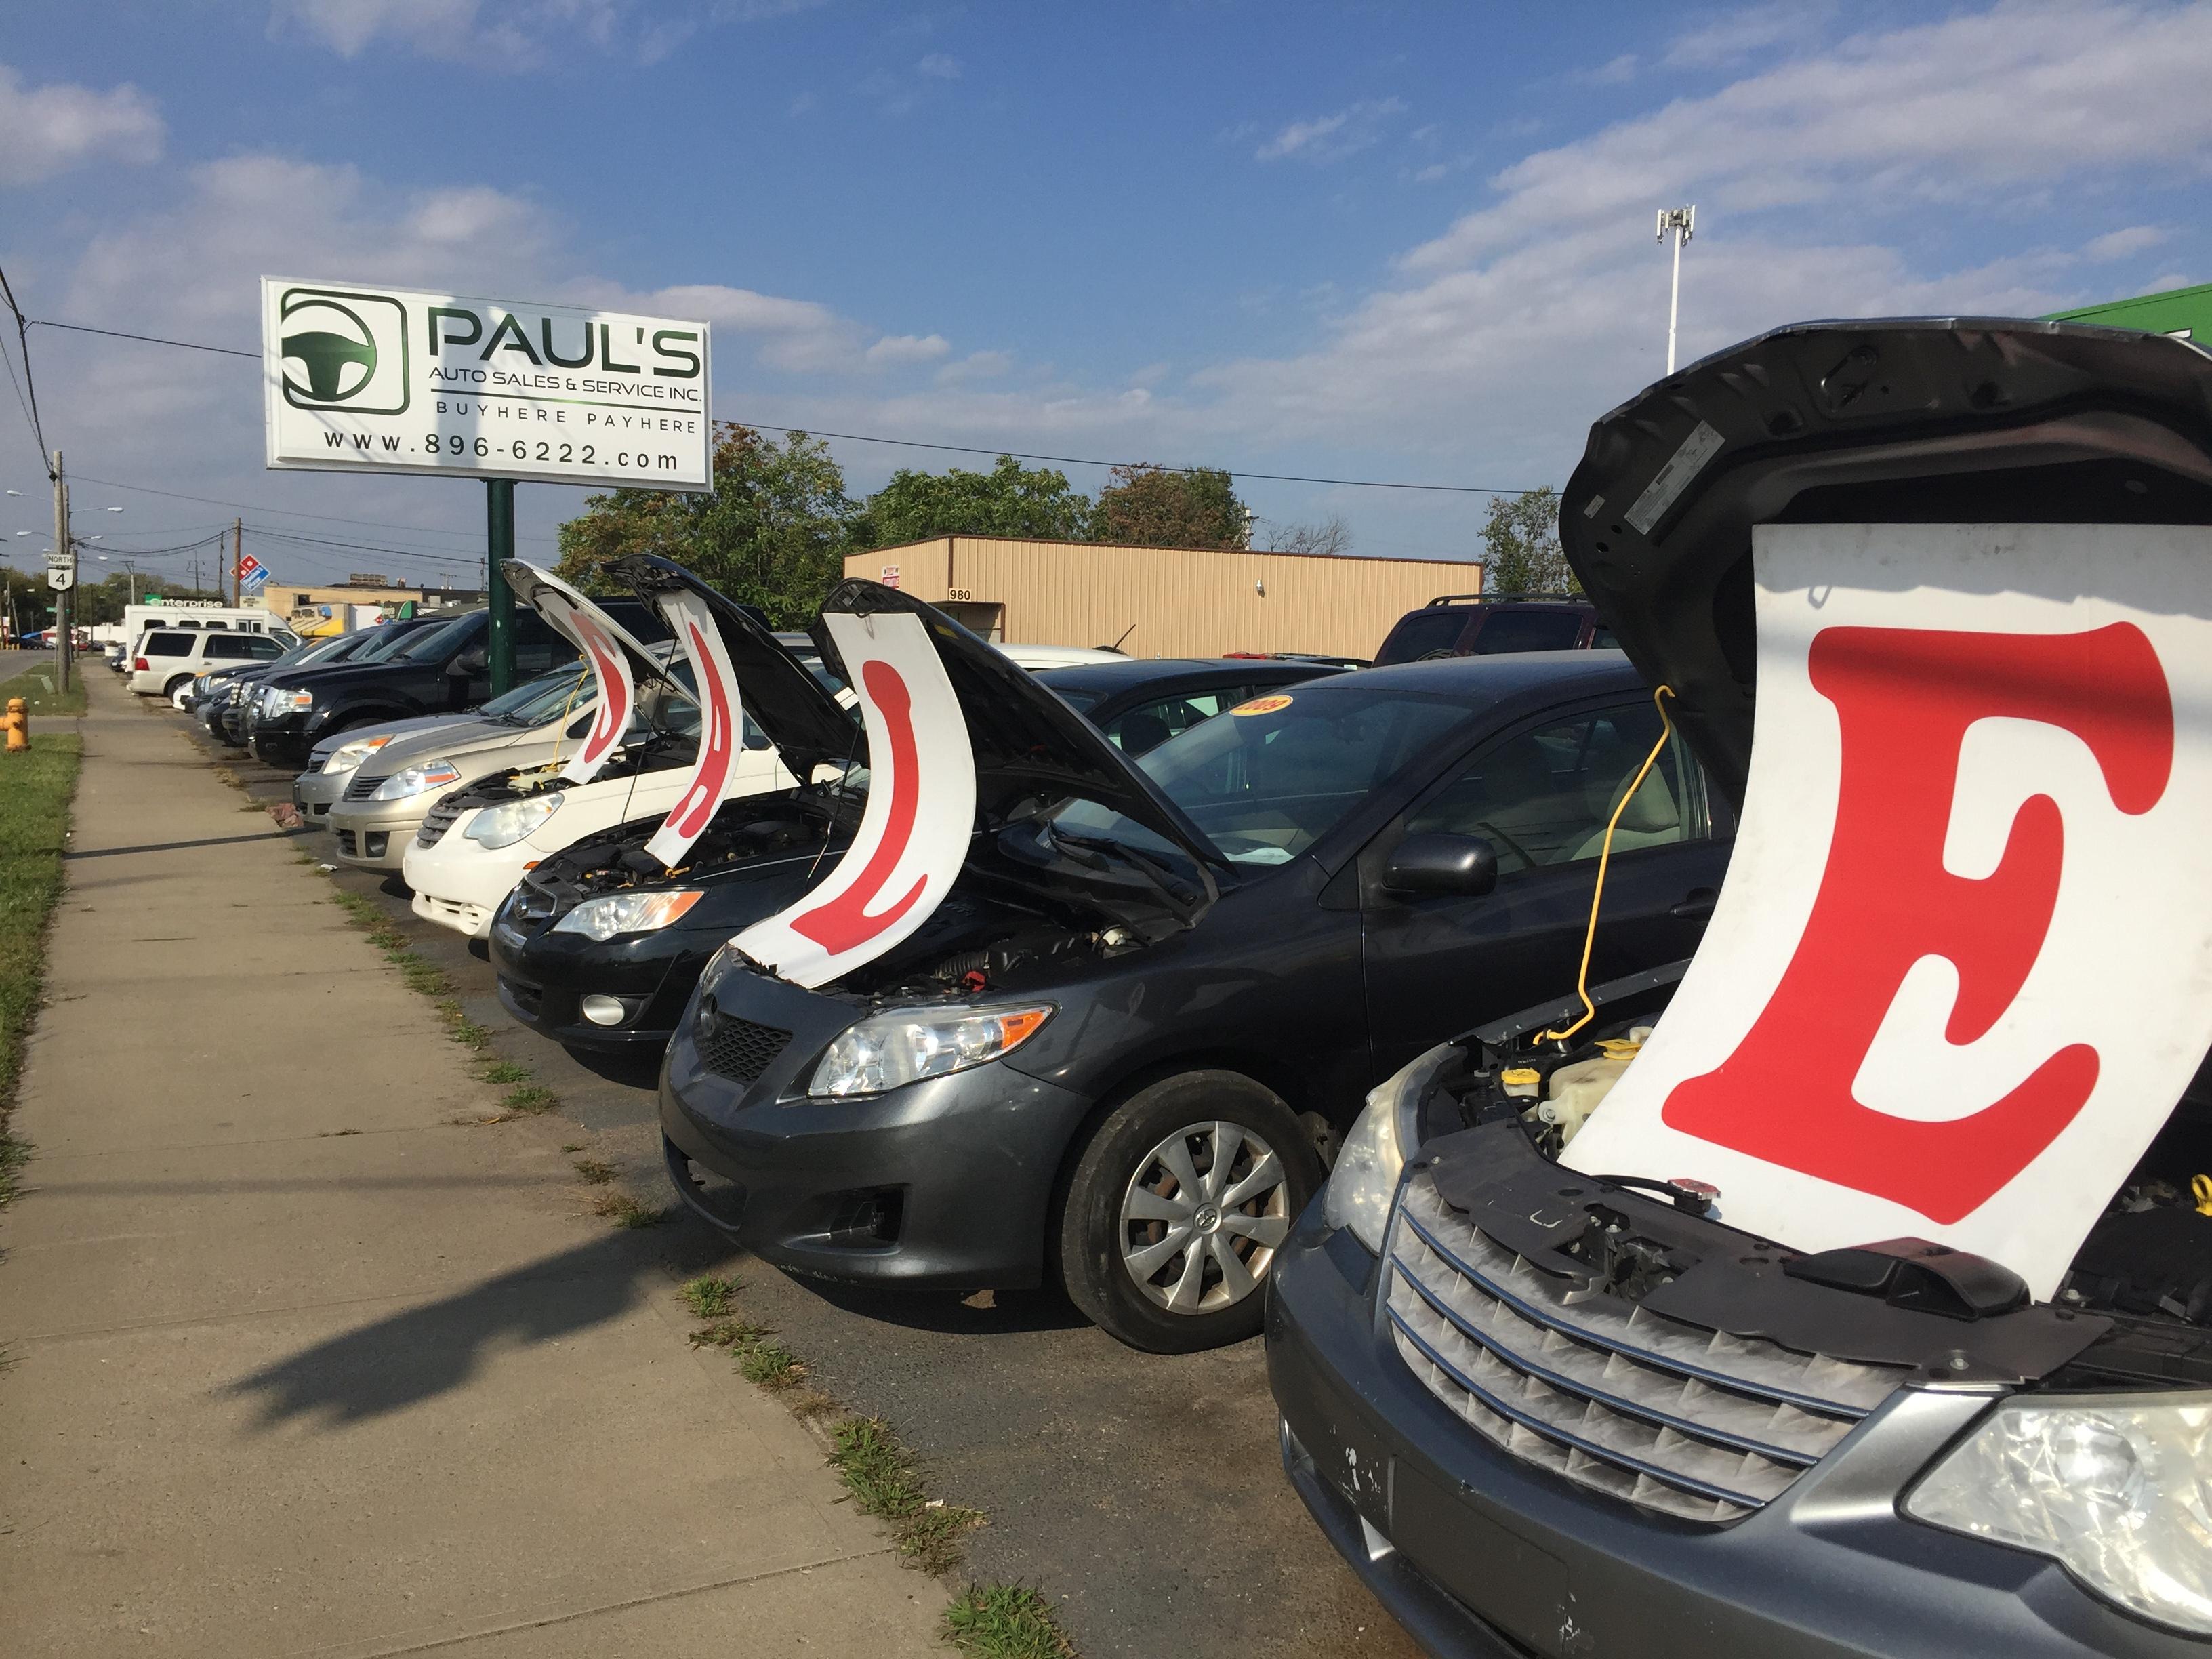 Paul s Auto Sales & Service 990 S Erie Hwy Hamilton OH YP